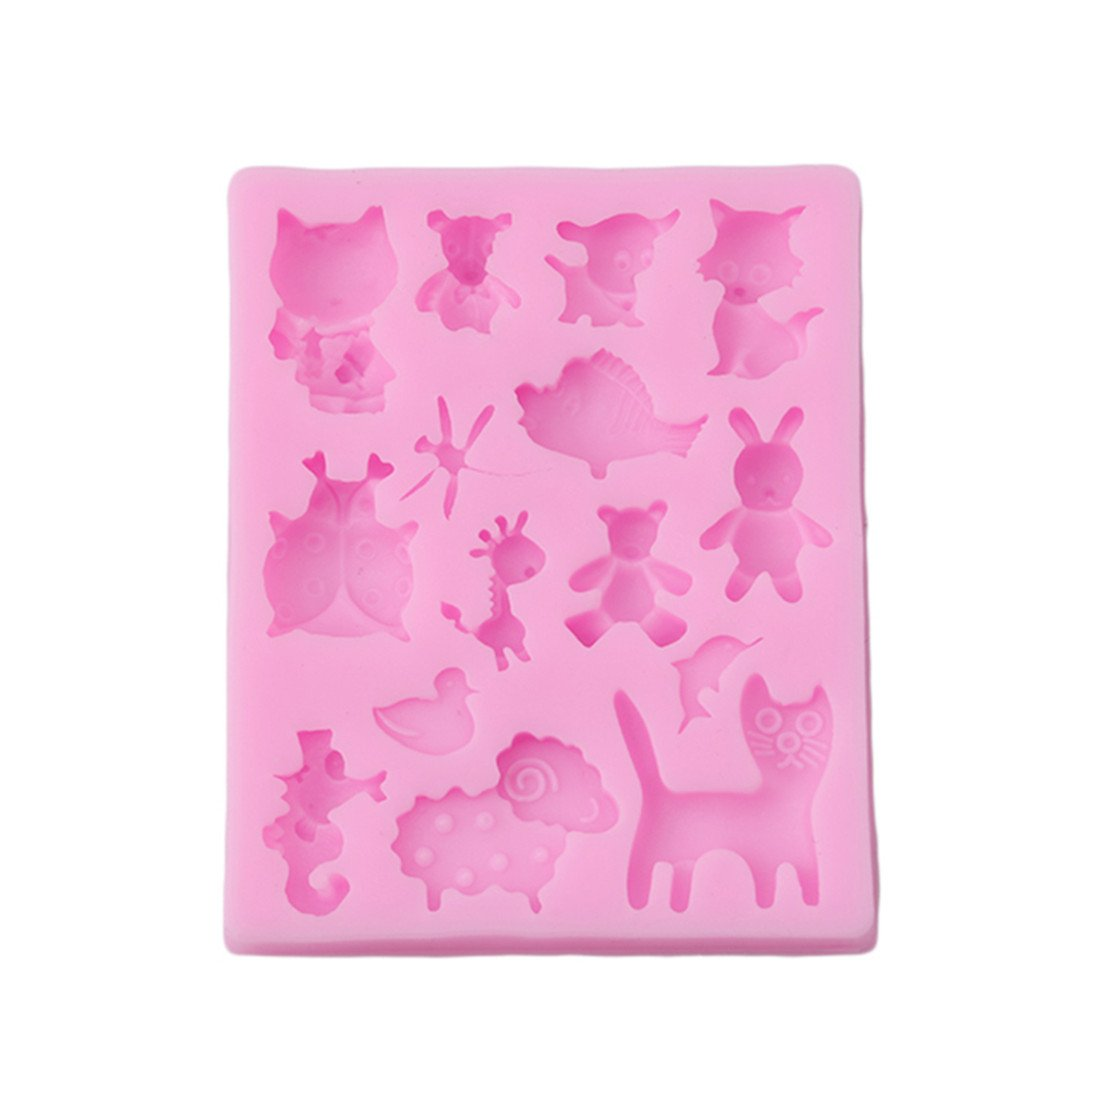 3D Sea Horse Fondant Silicone Mold Decorating Tool Cake Chocolate Soap Mould DIY